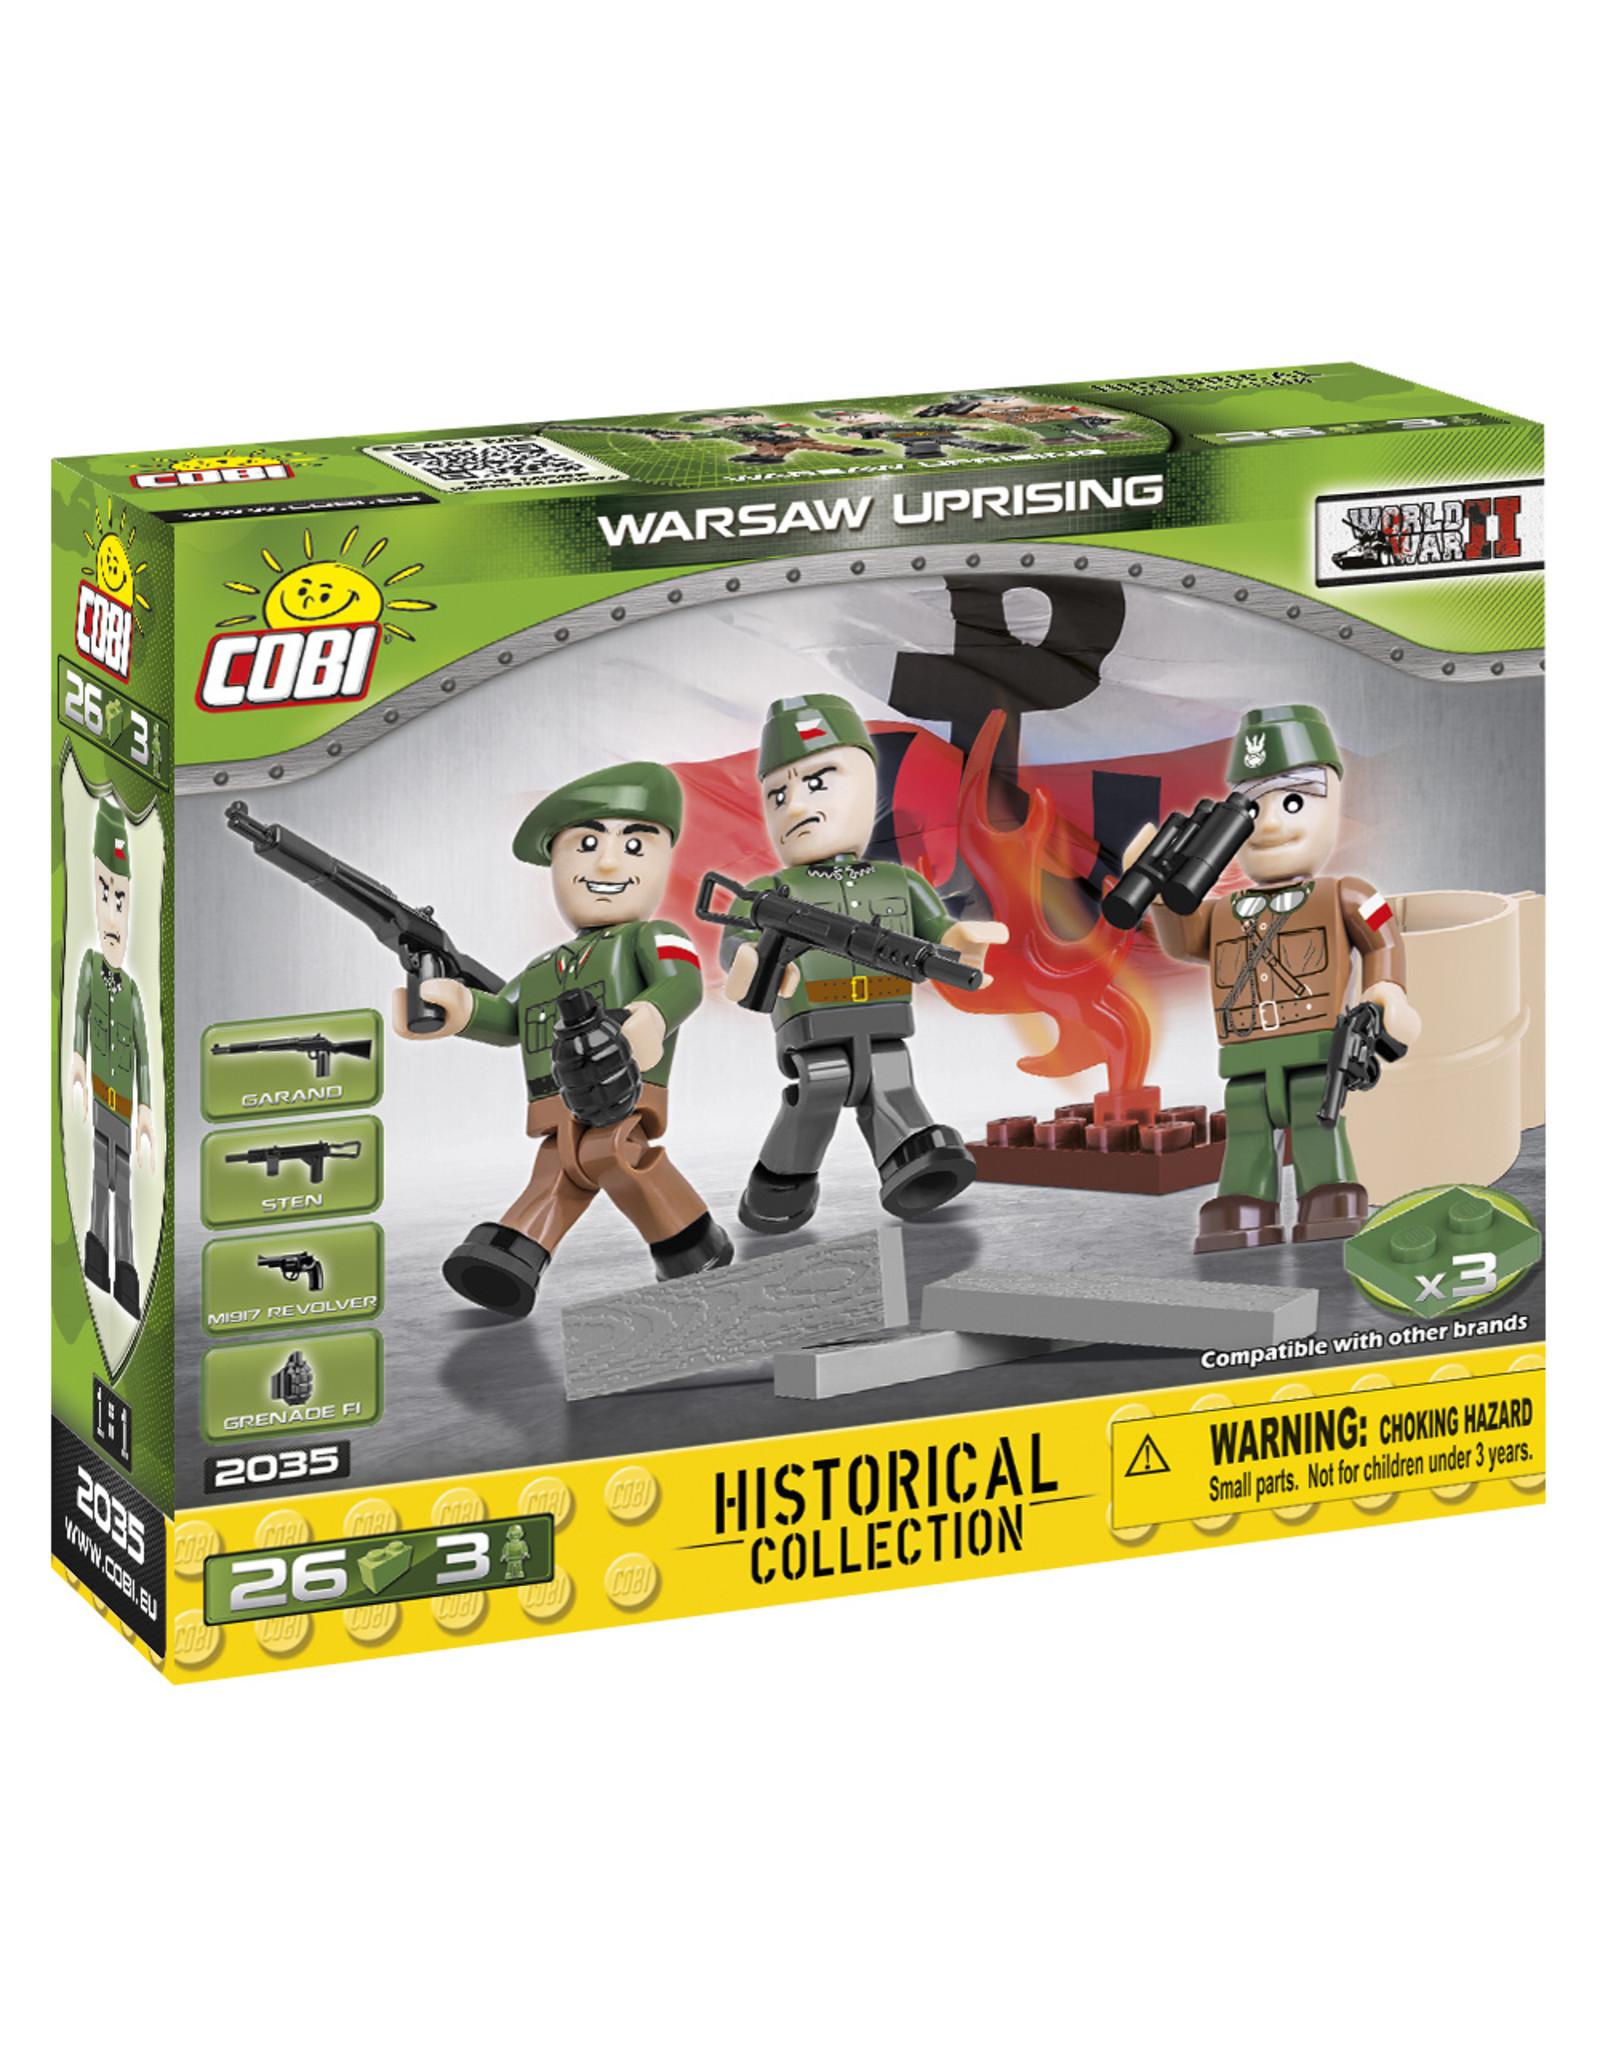 COBI COBI WW2  2035 - Figures Warschaw Uprising